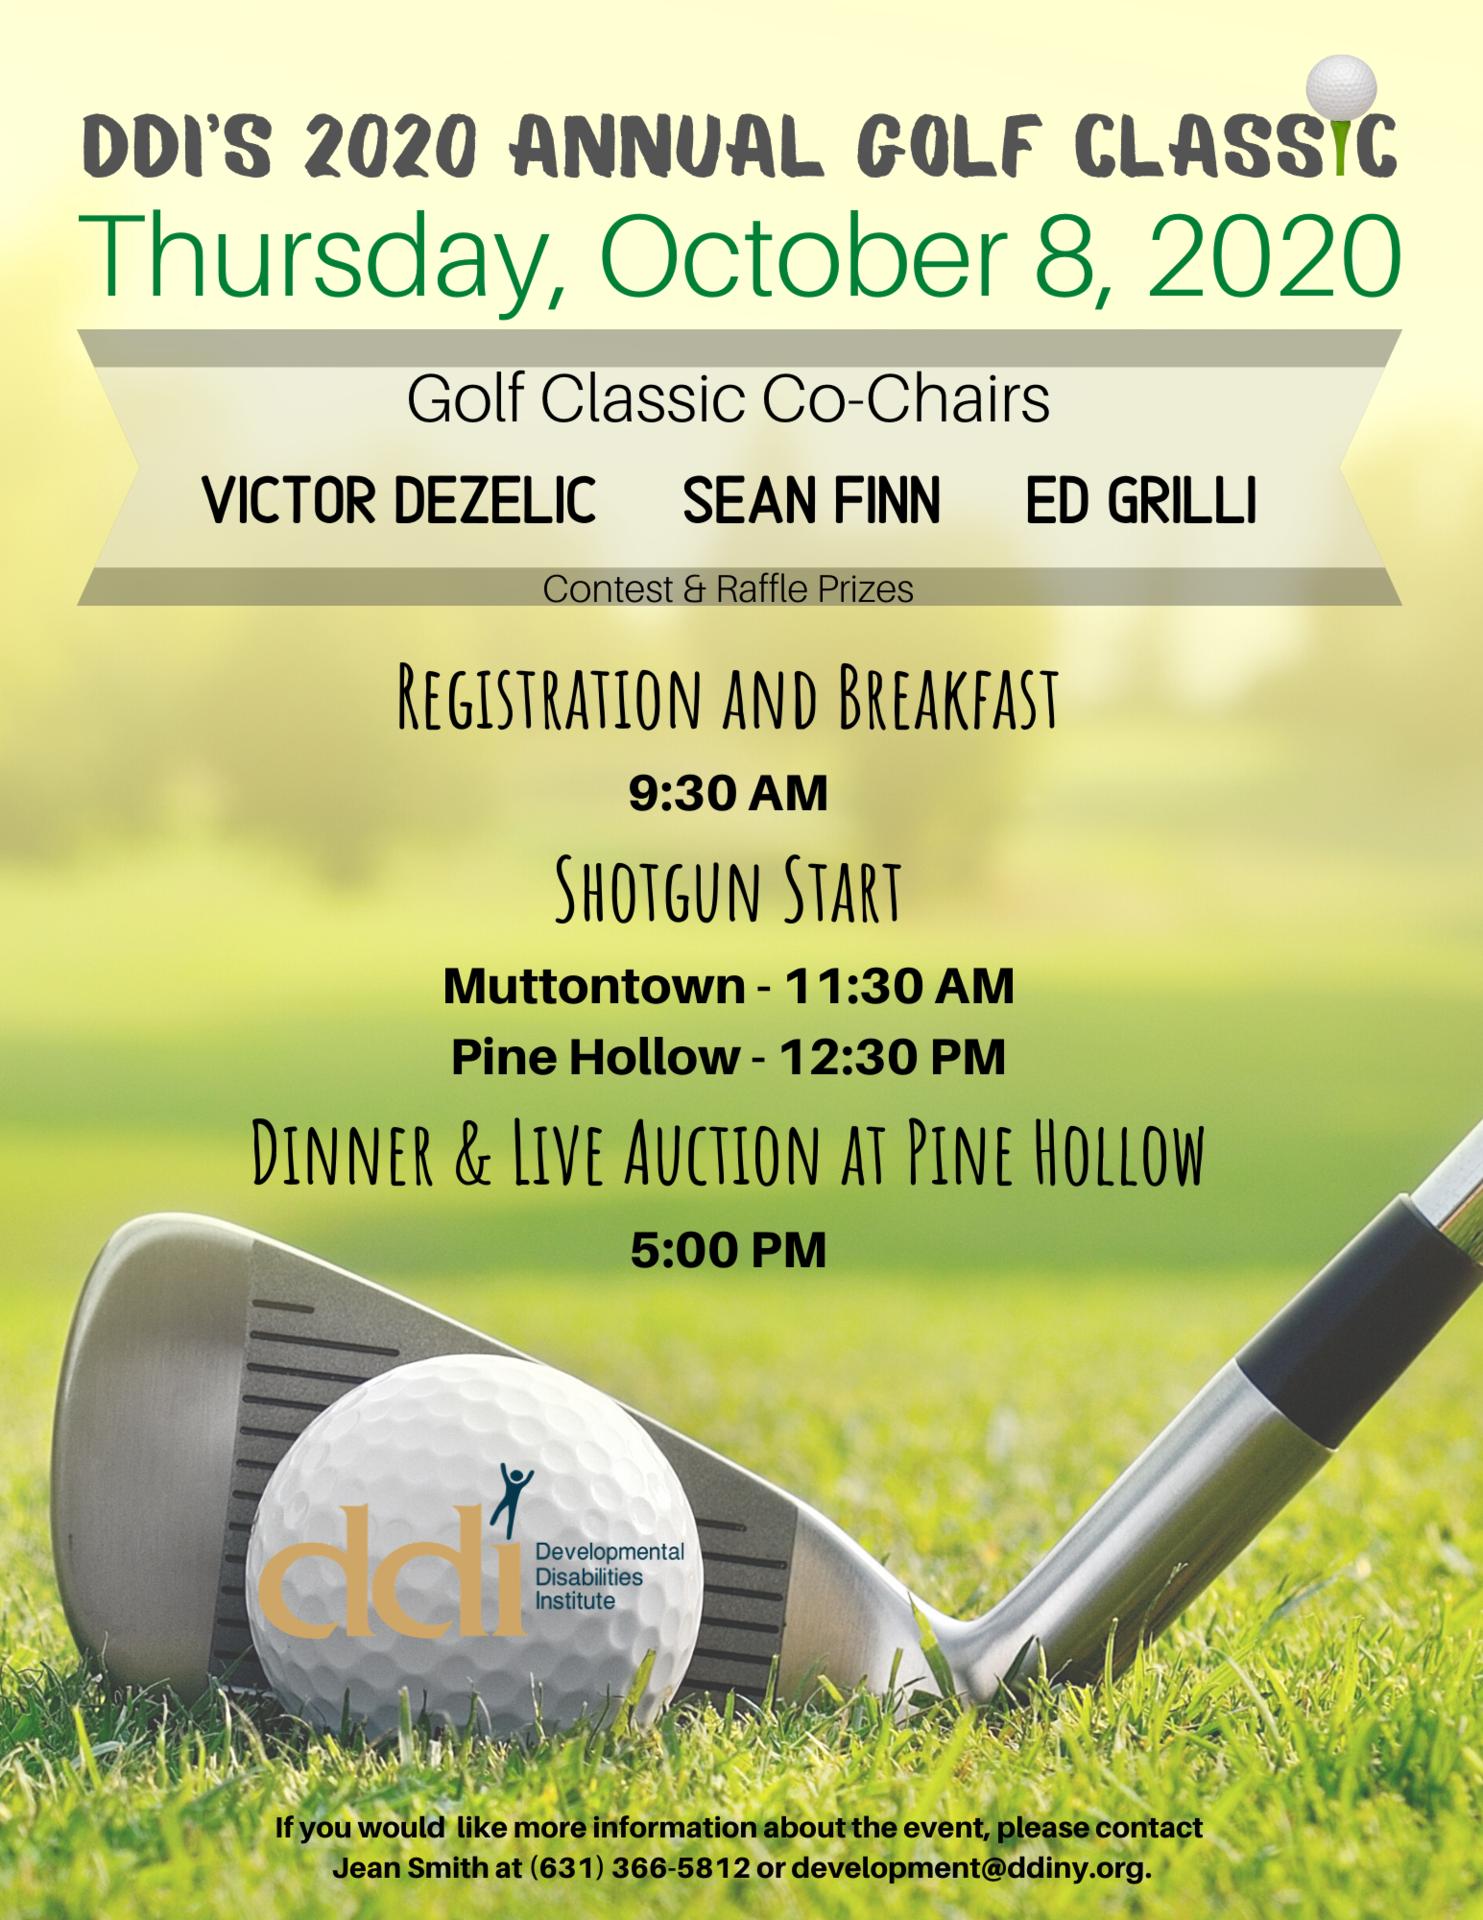 DDI 2020 Annual Golf Classic